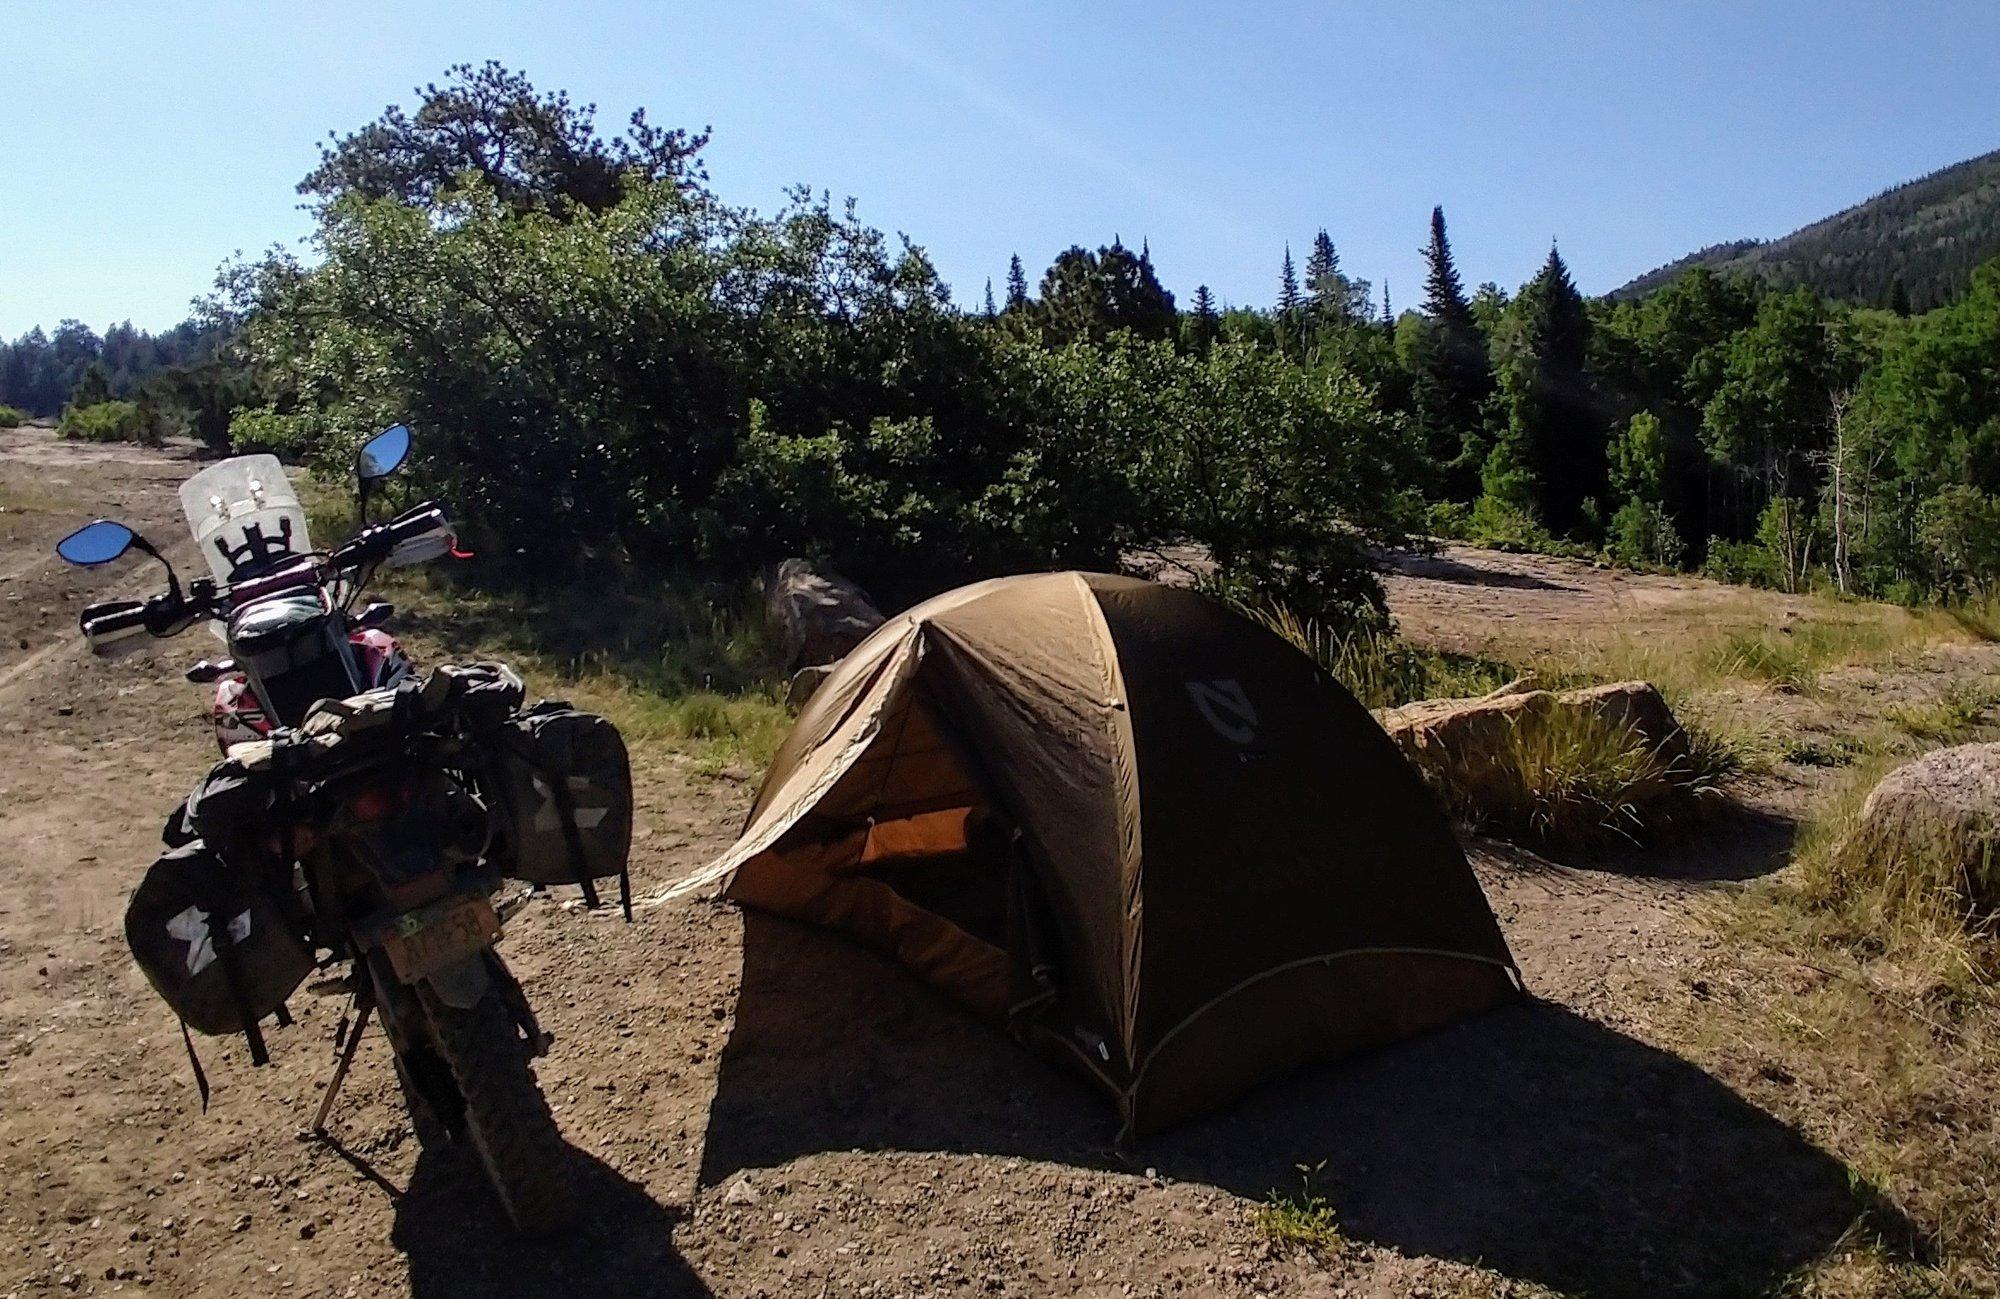 camping_usa.jpg